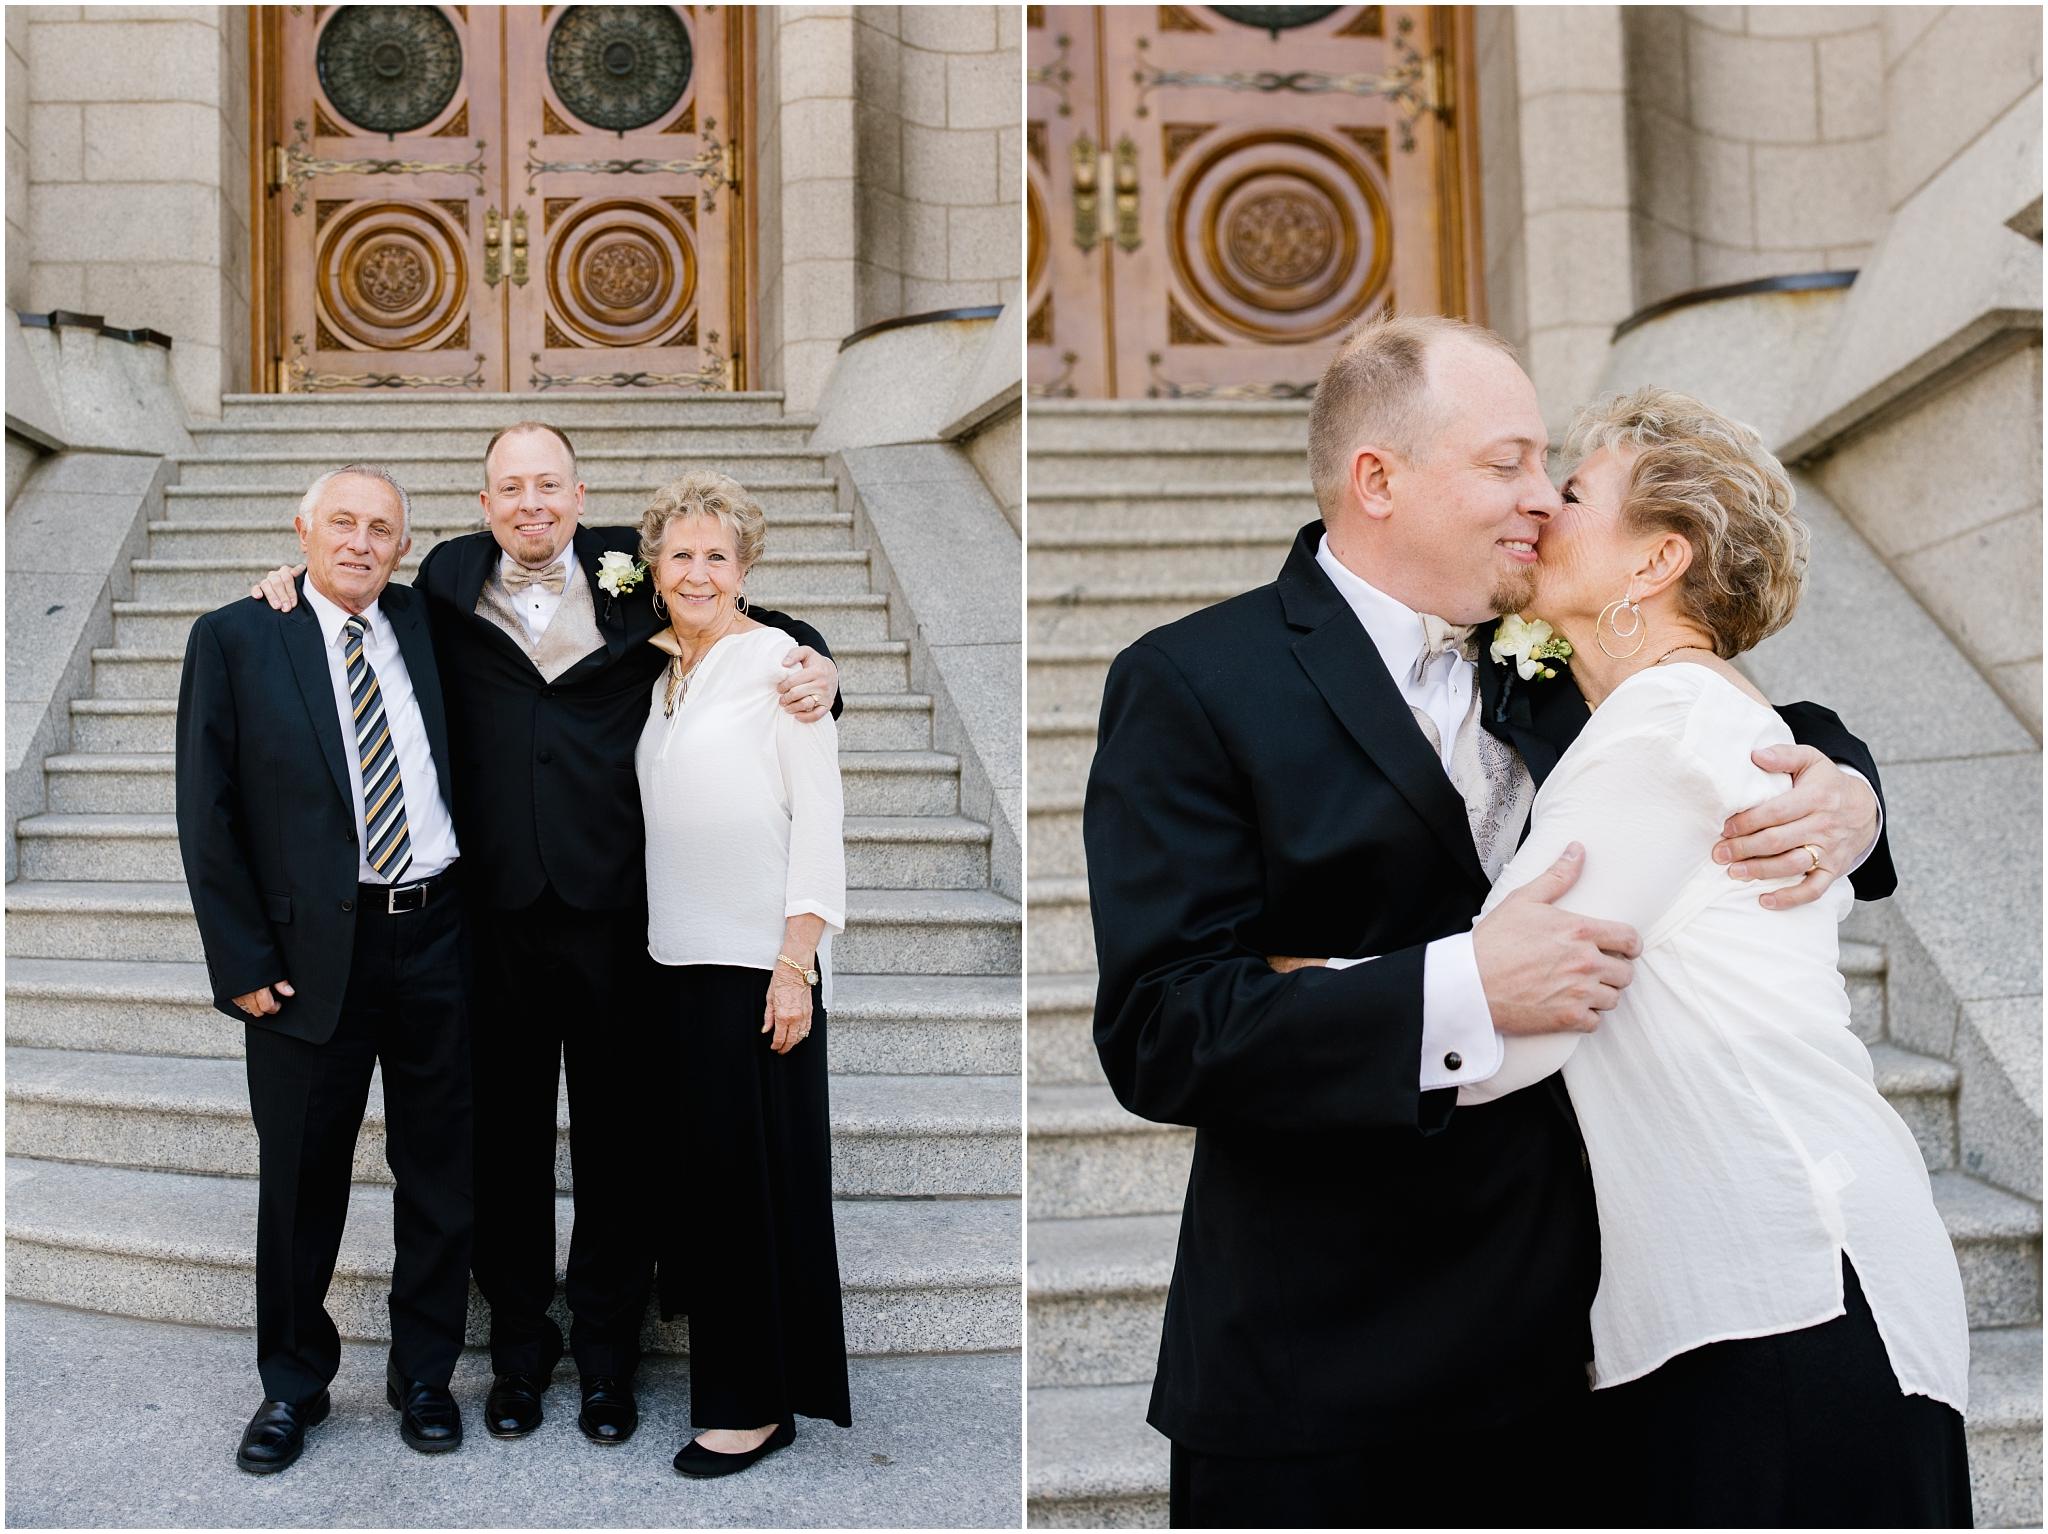 CherylandTyler-66_Lizzie-B-Imagery-Utah-Wedding-Photographer-Salt-Lake-City-Temple-Wells-Fargo-Building-Reception.jpg